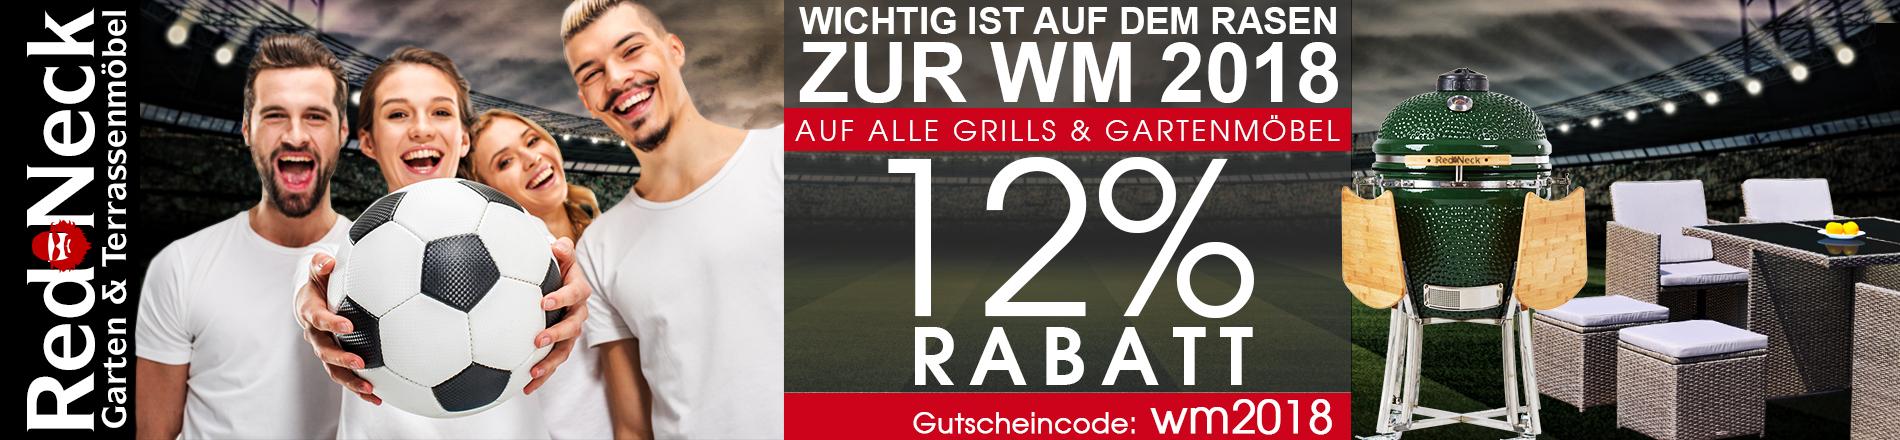 12% WM-Rabatt auf Gartenmöbel & Keramikgrills